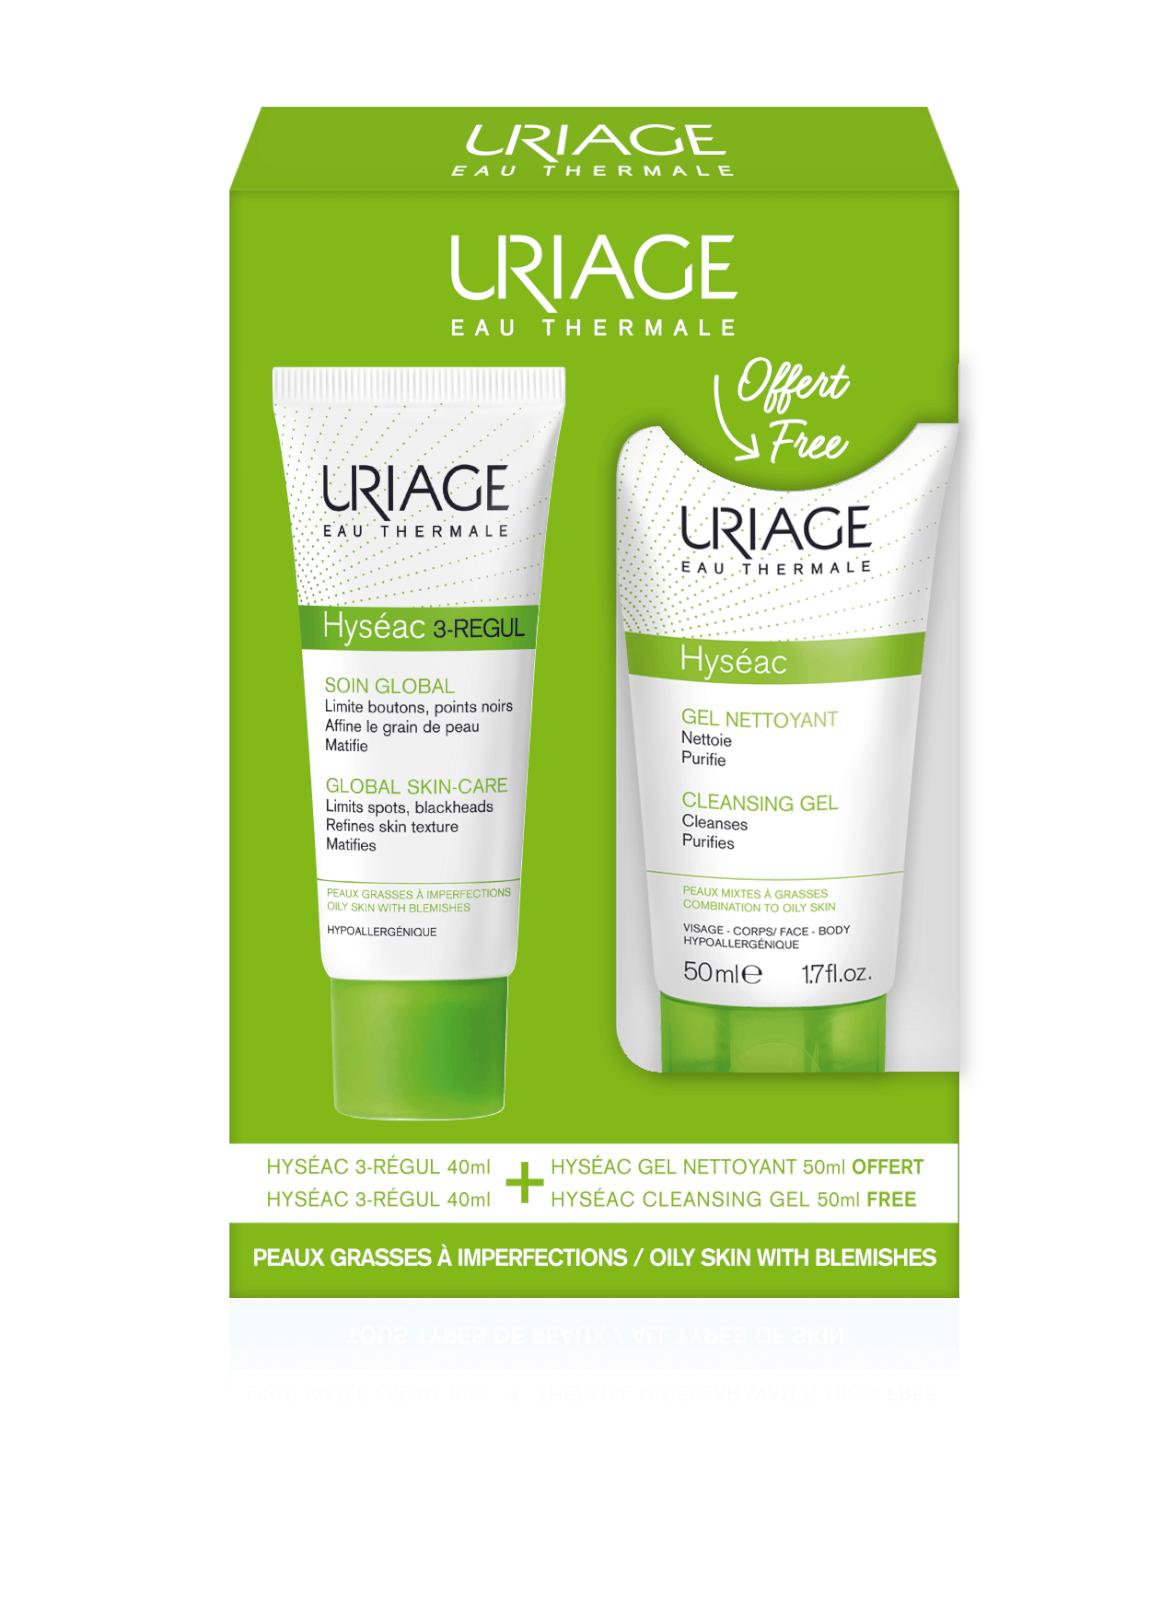 Купить Uriage Hyséac 3-Régul Global Skin Care 40ml + Cleansing Gel 50ml Free